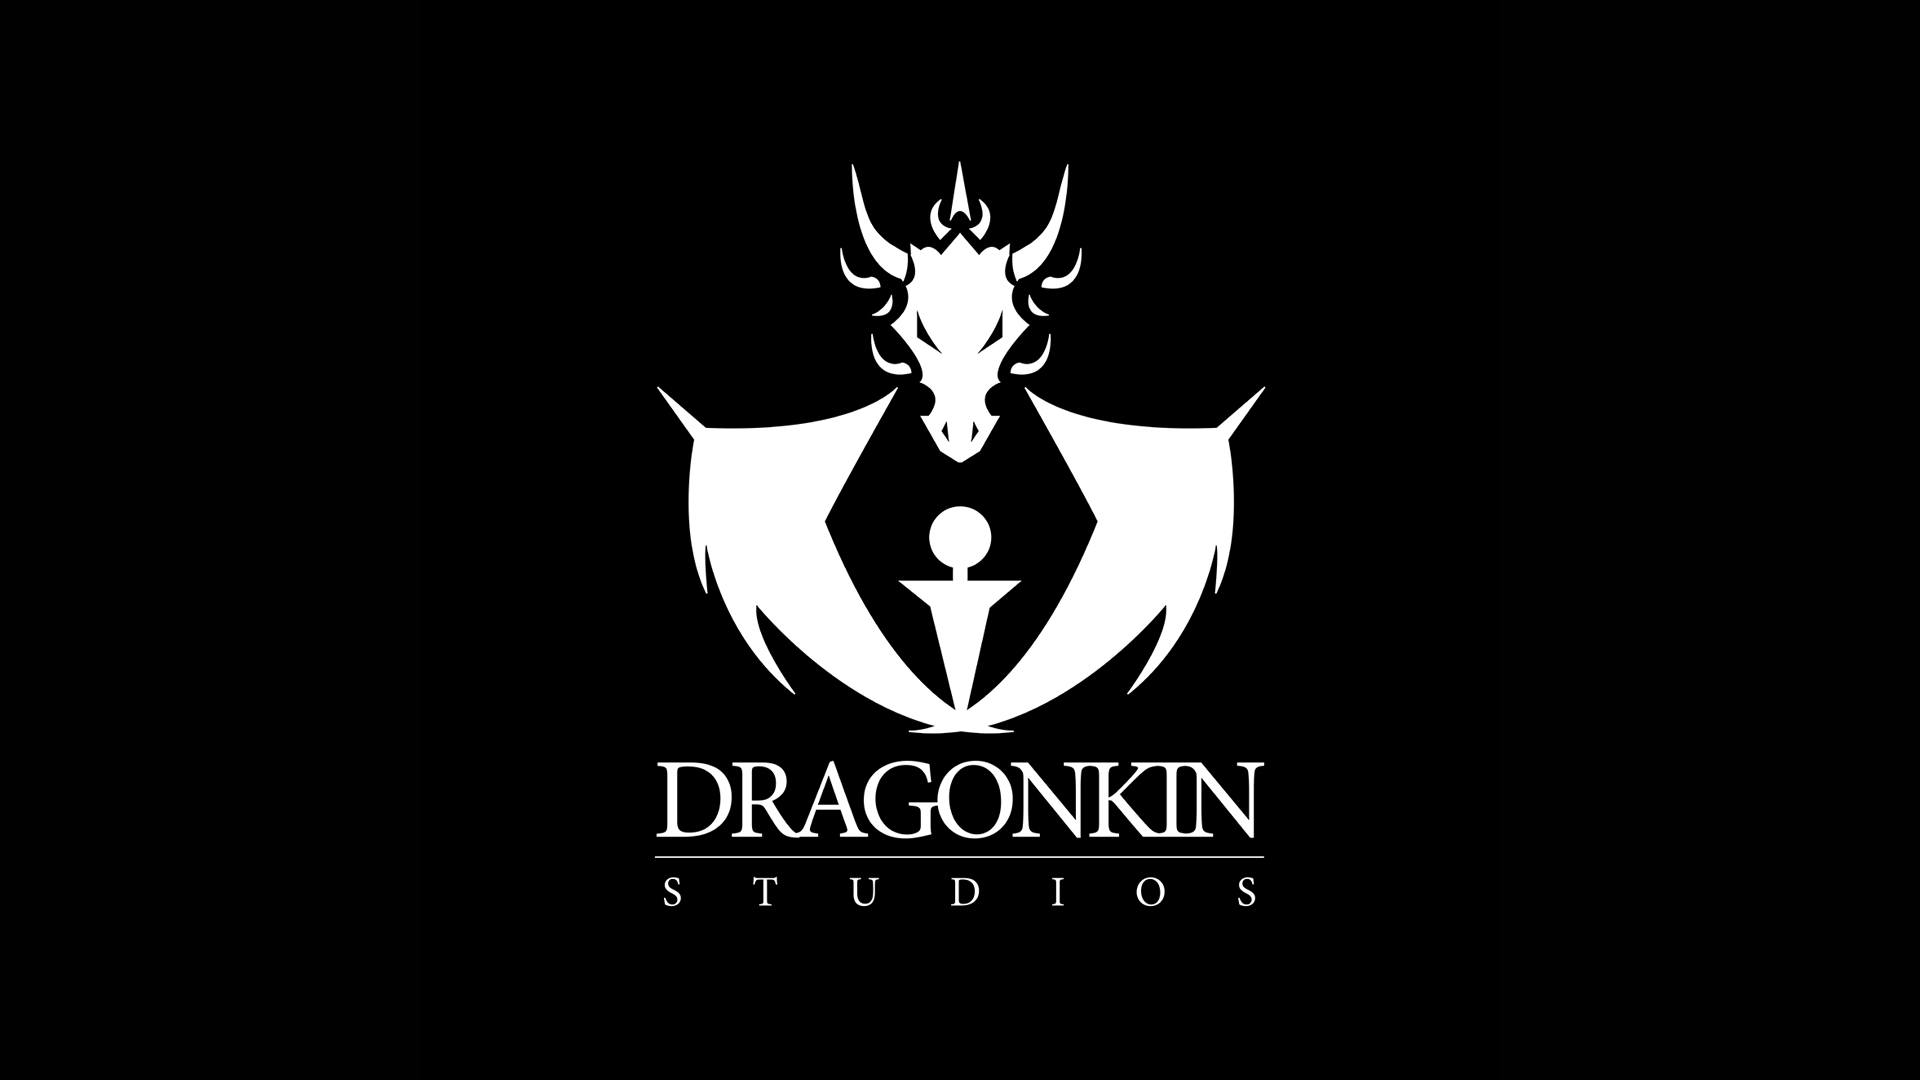 DragonkinStudiosLogo1920x1080